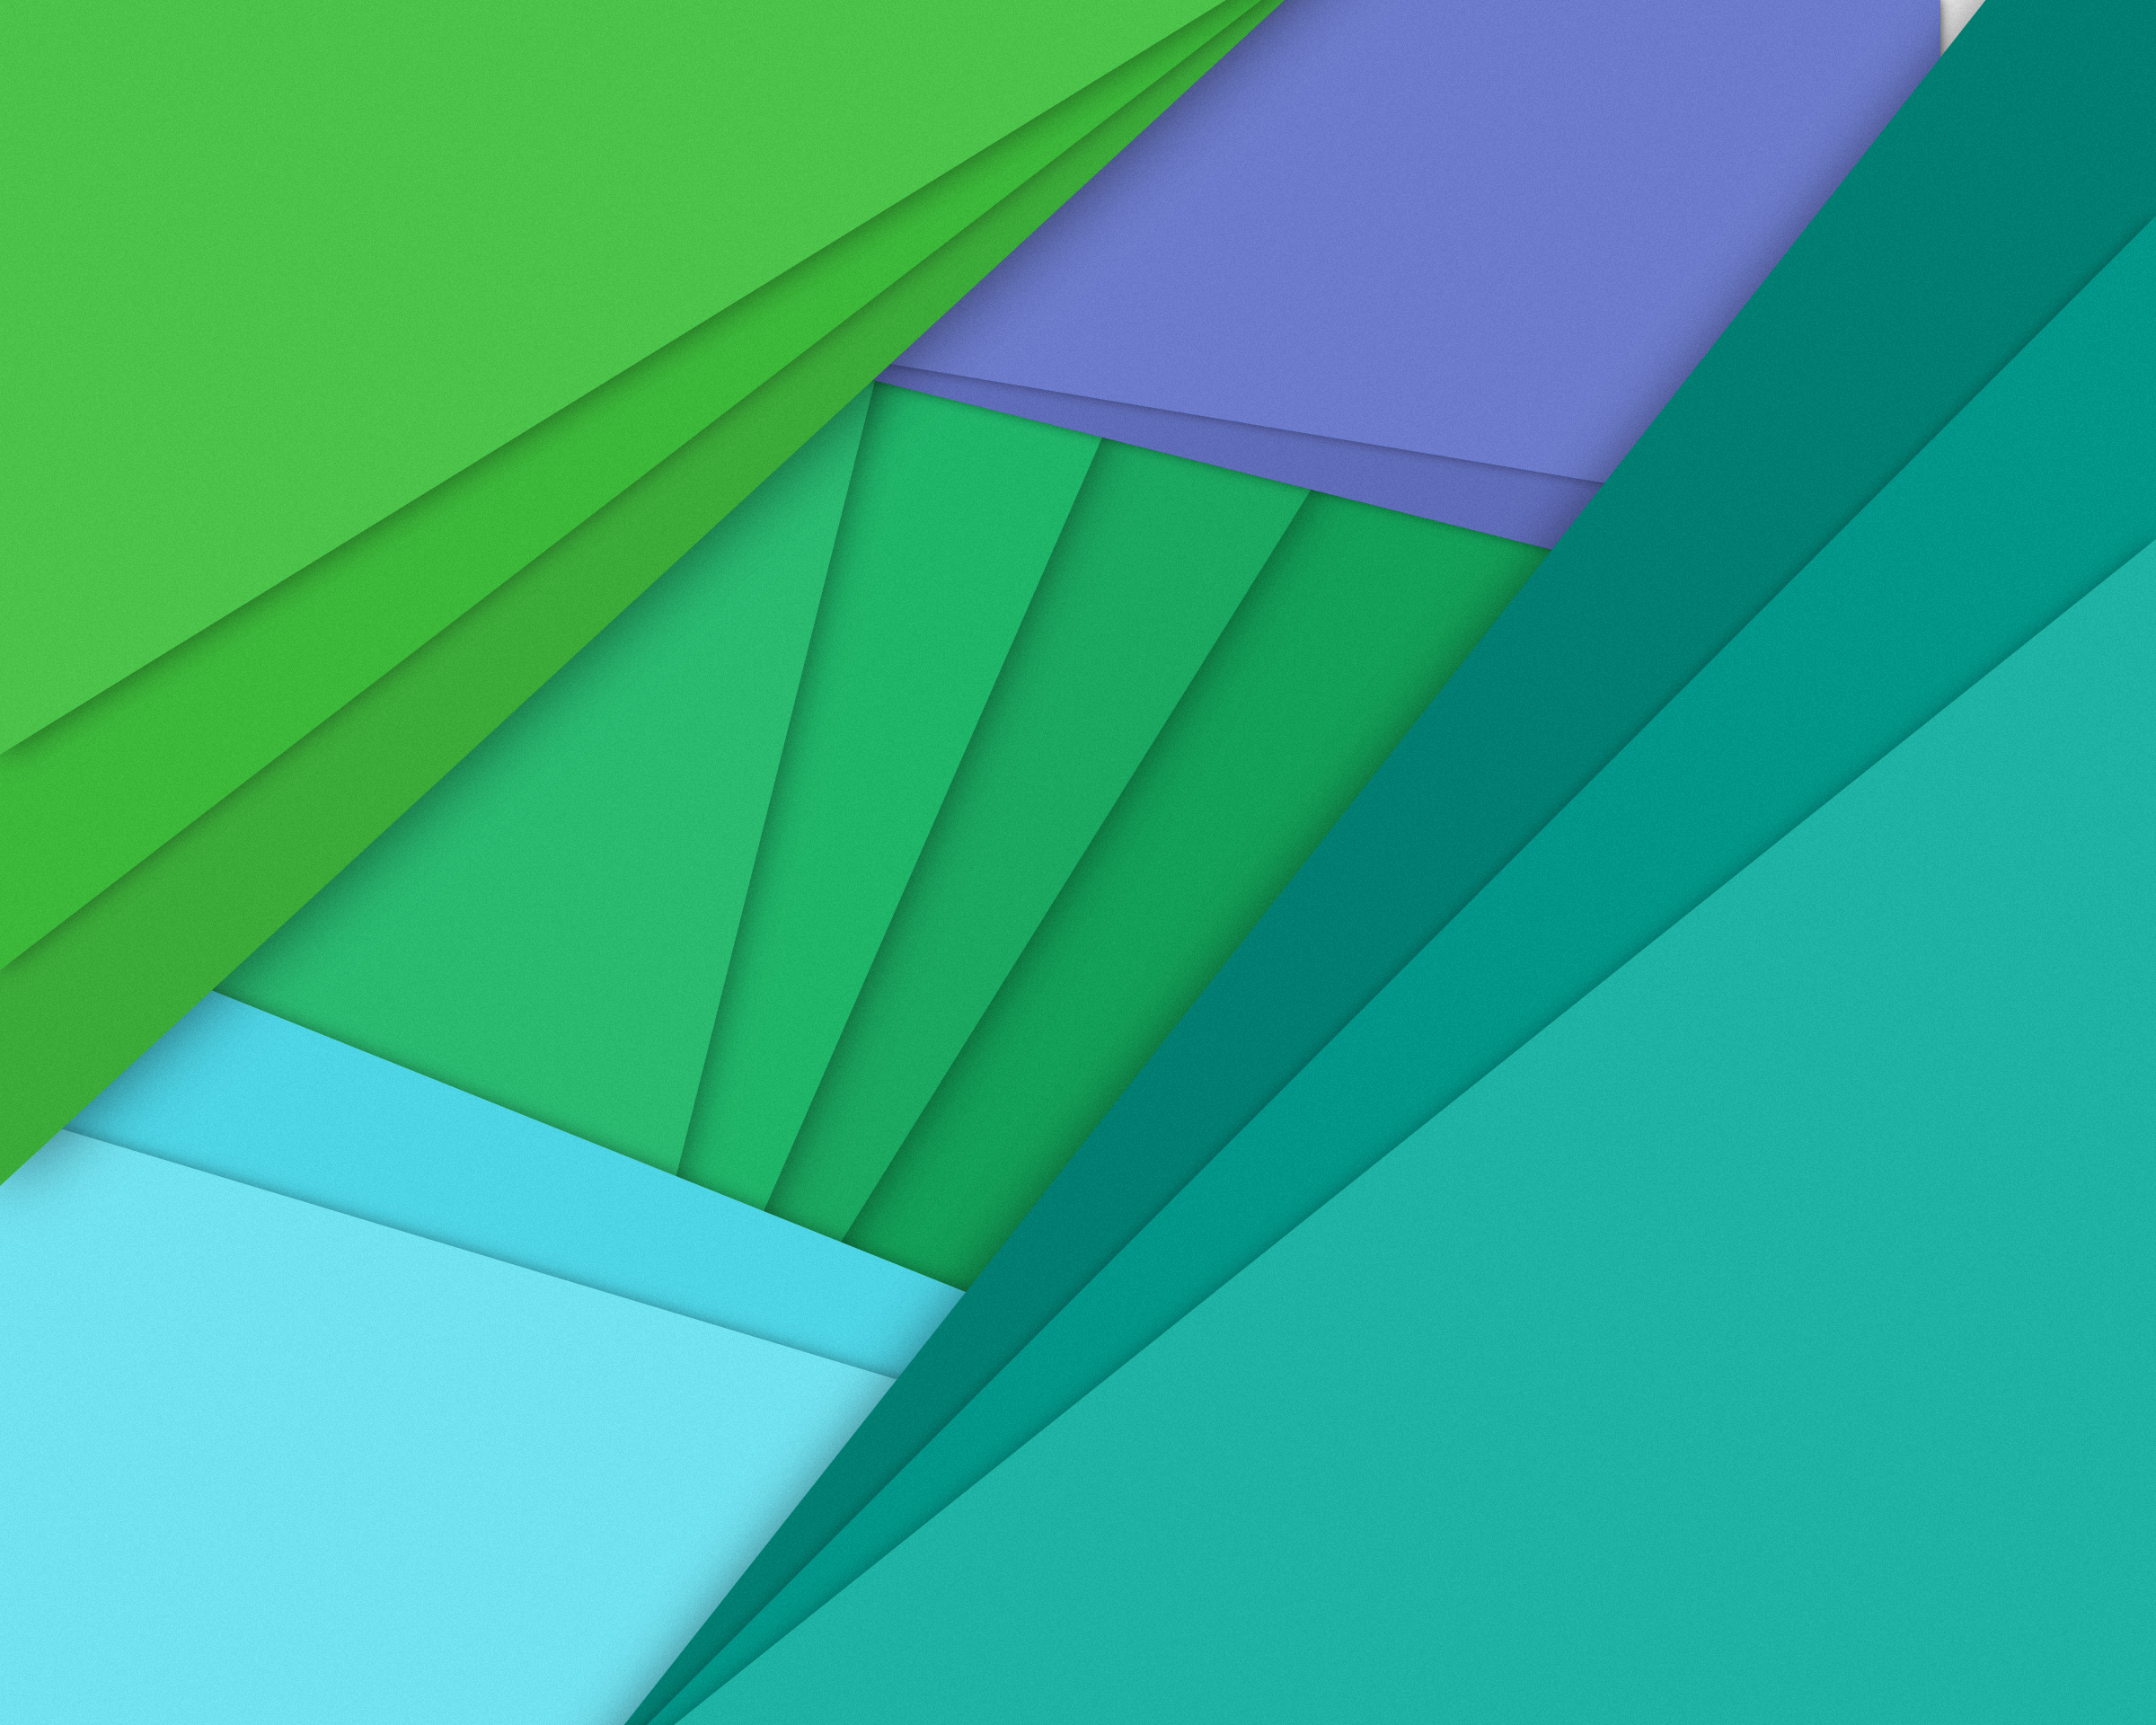 Teal Paper - Wallpaper for Nexus 7